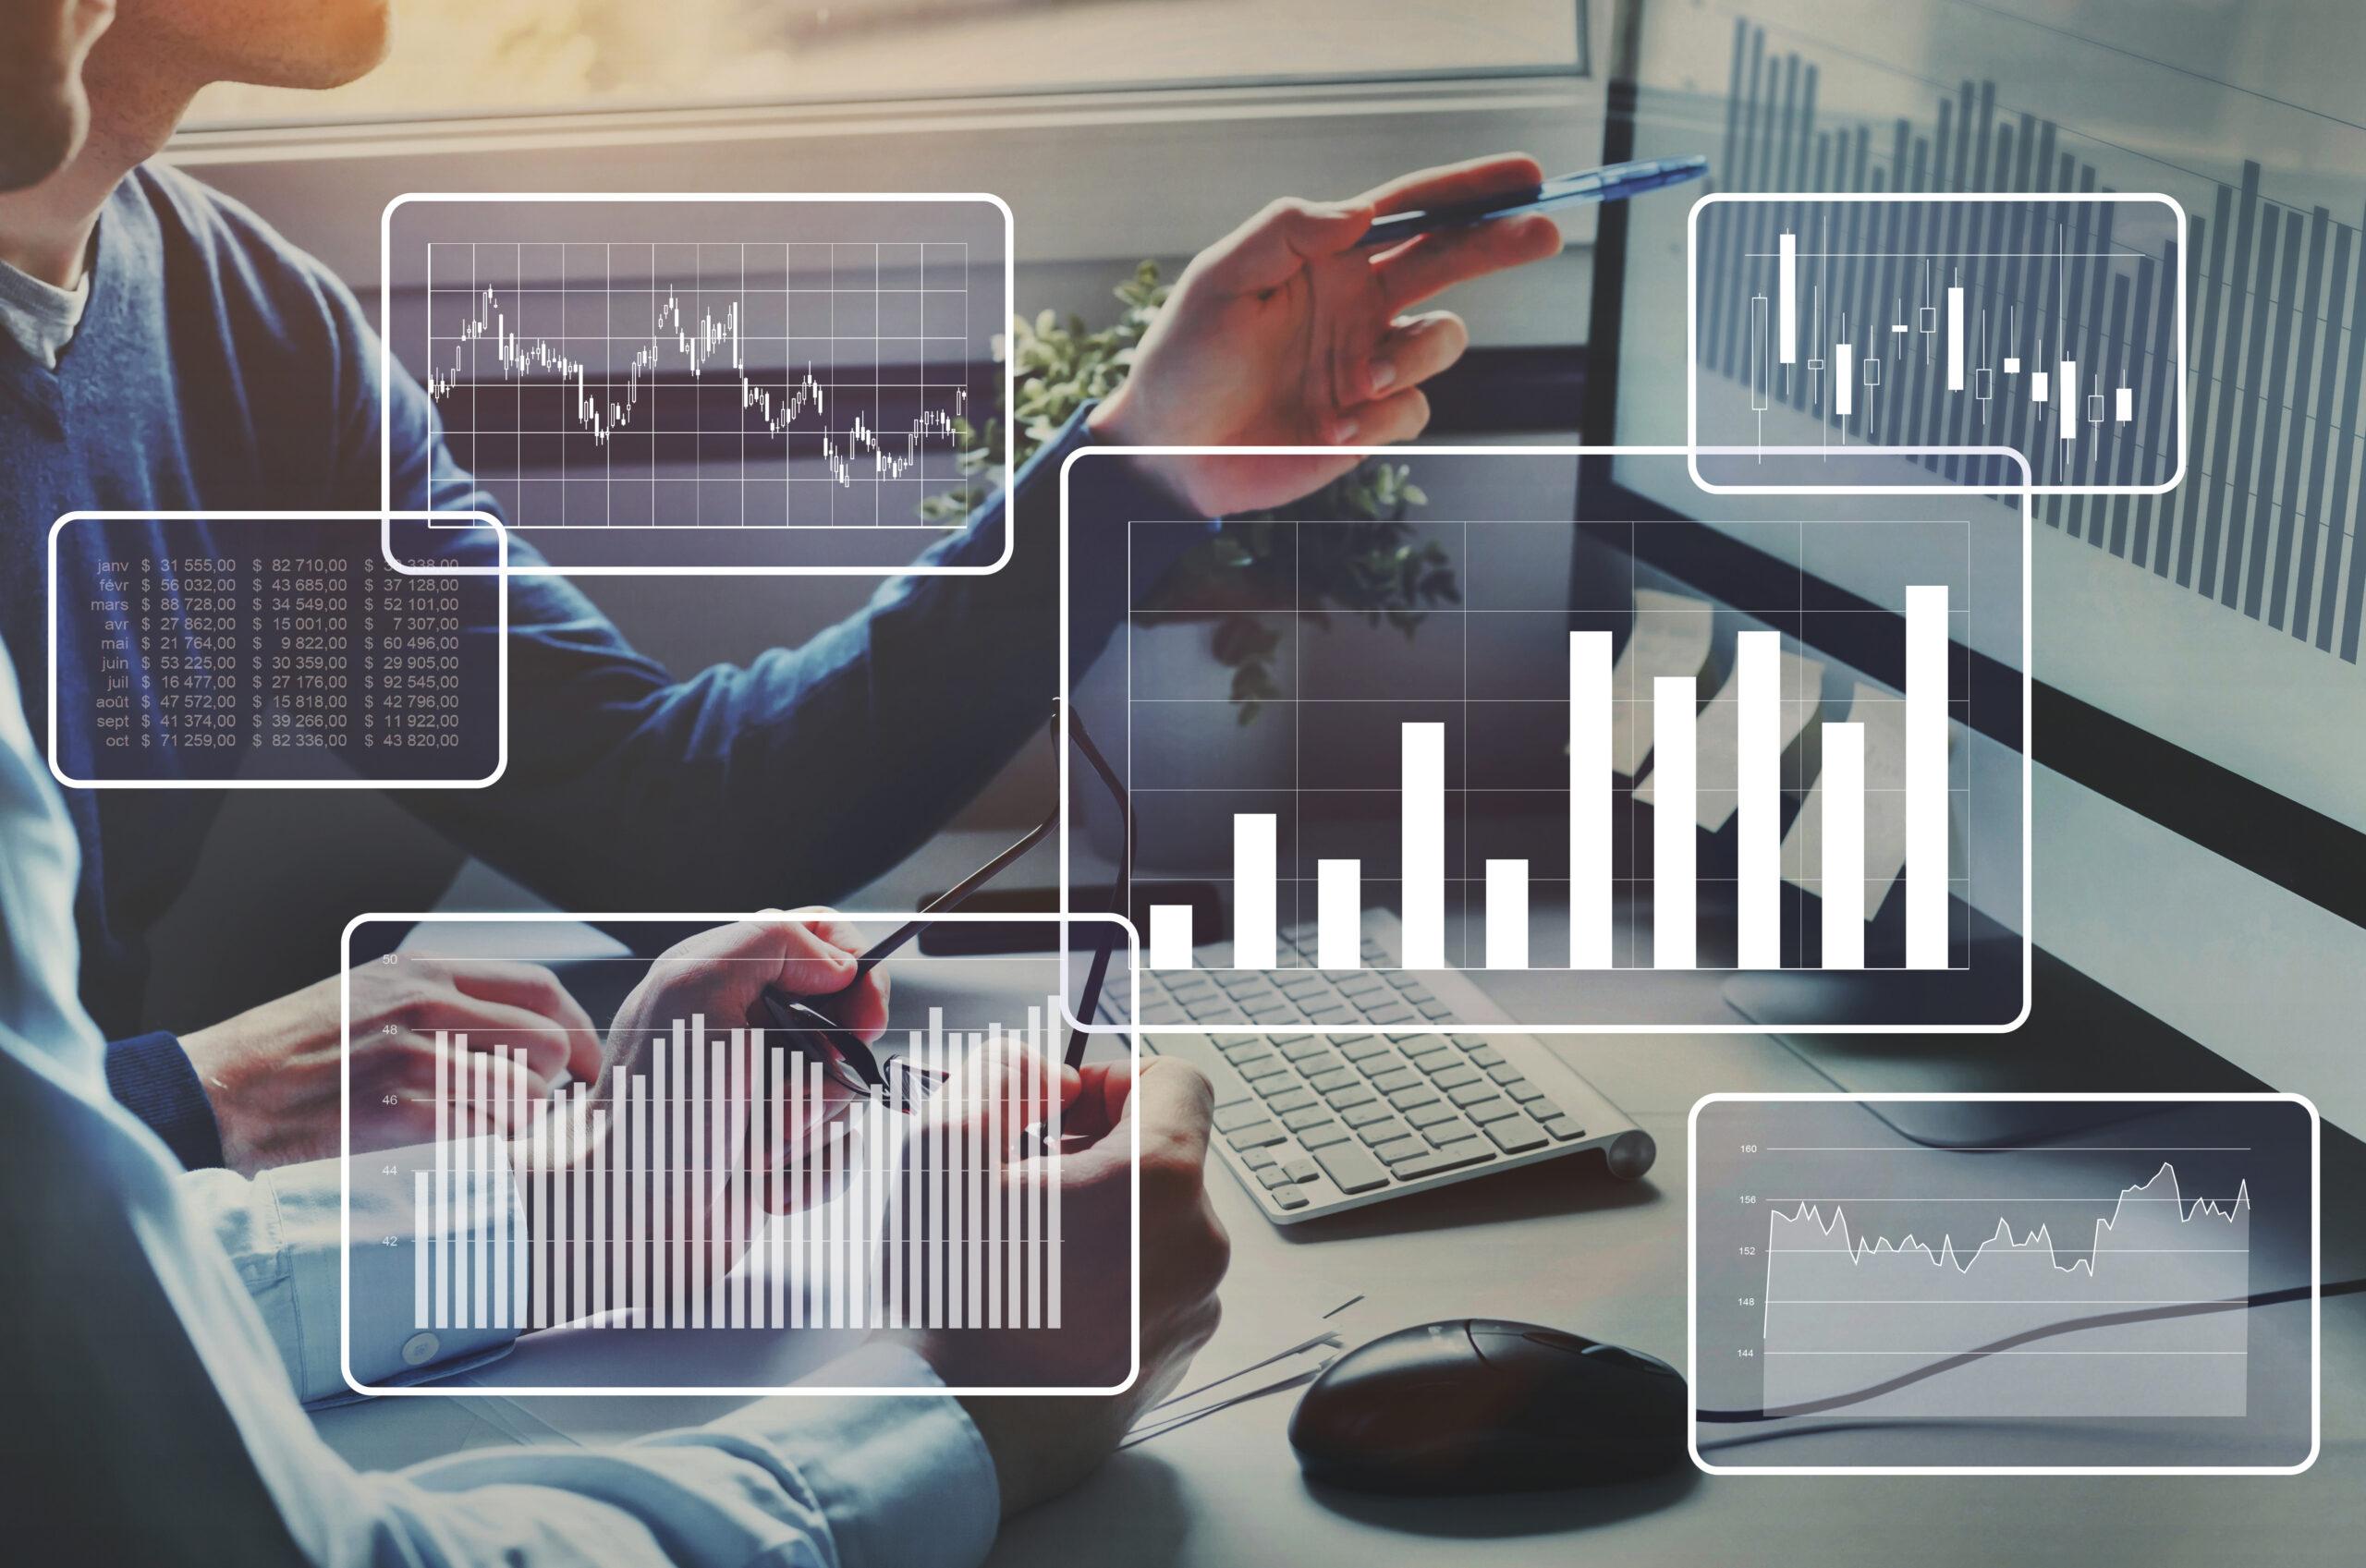 cloud management platform performance monitoring